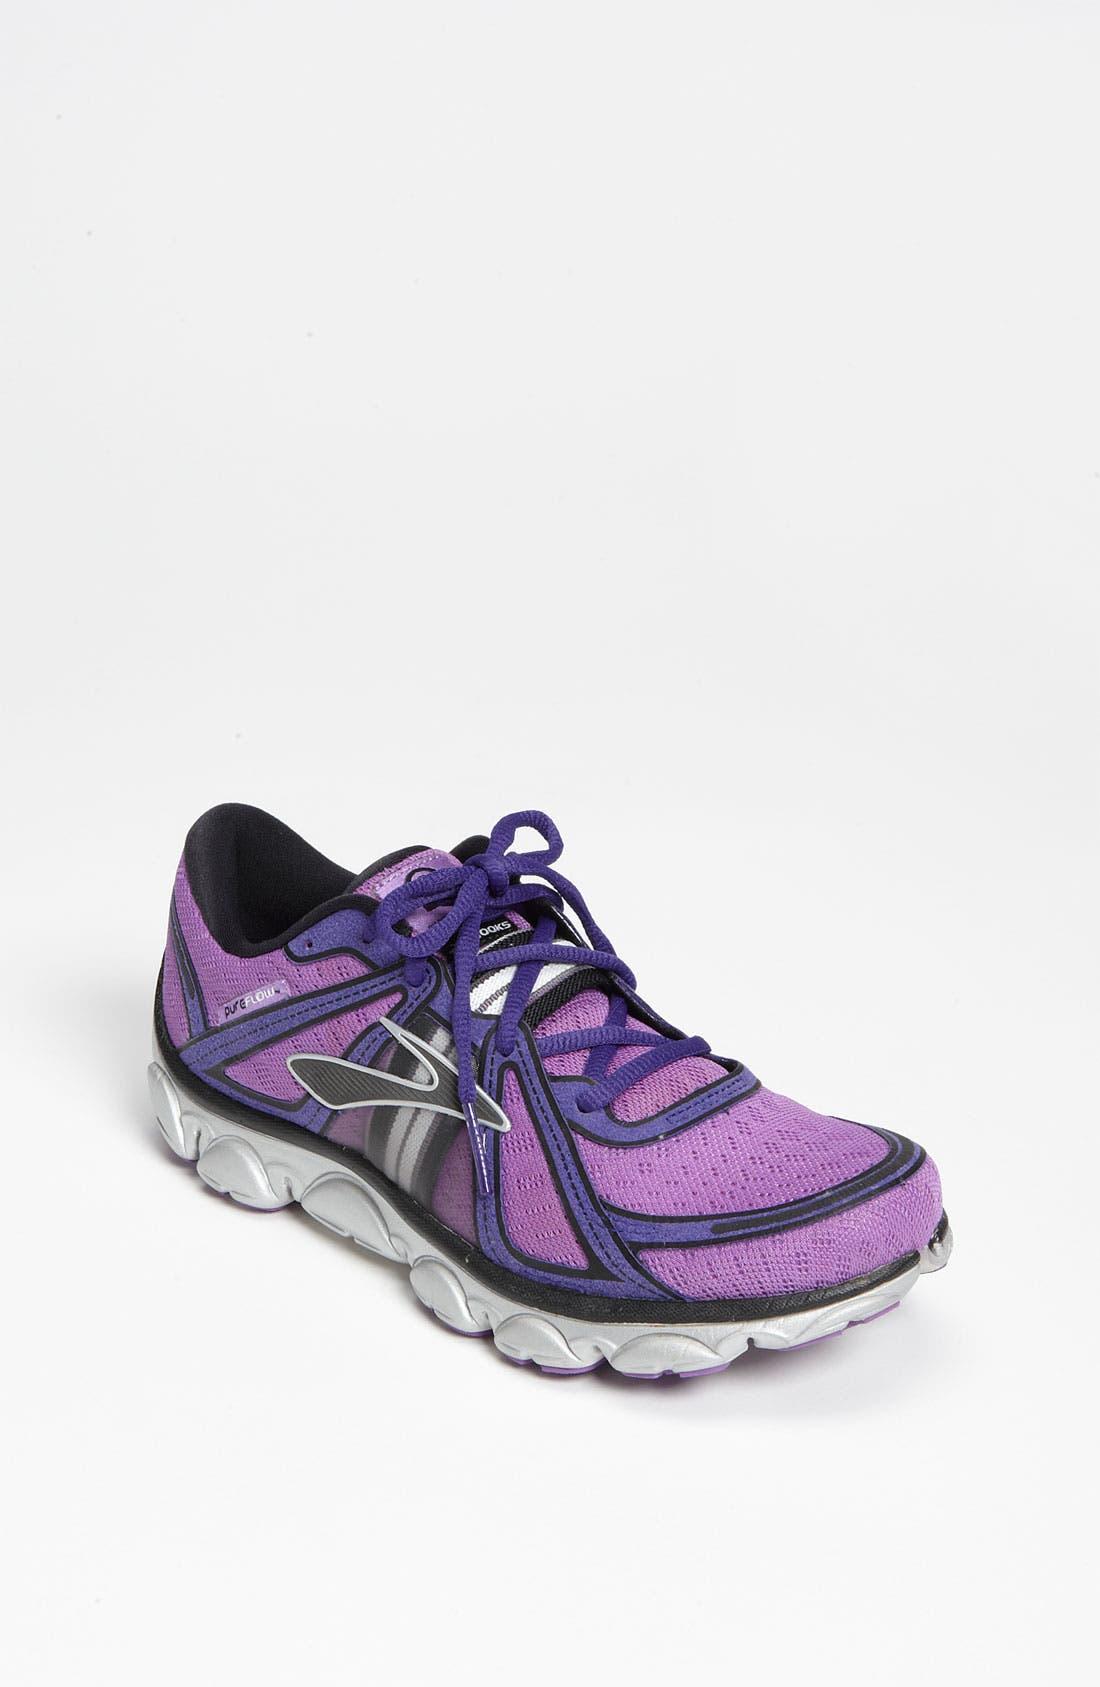 Main Image - Brooks 'PureFlow' Running Shoe (Women) (Regular Retail Price: $89.95)